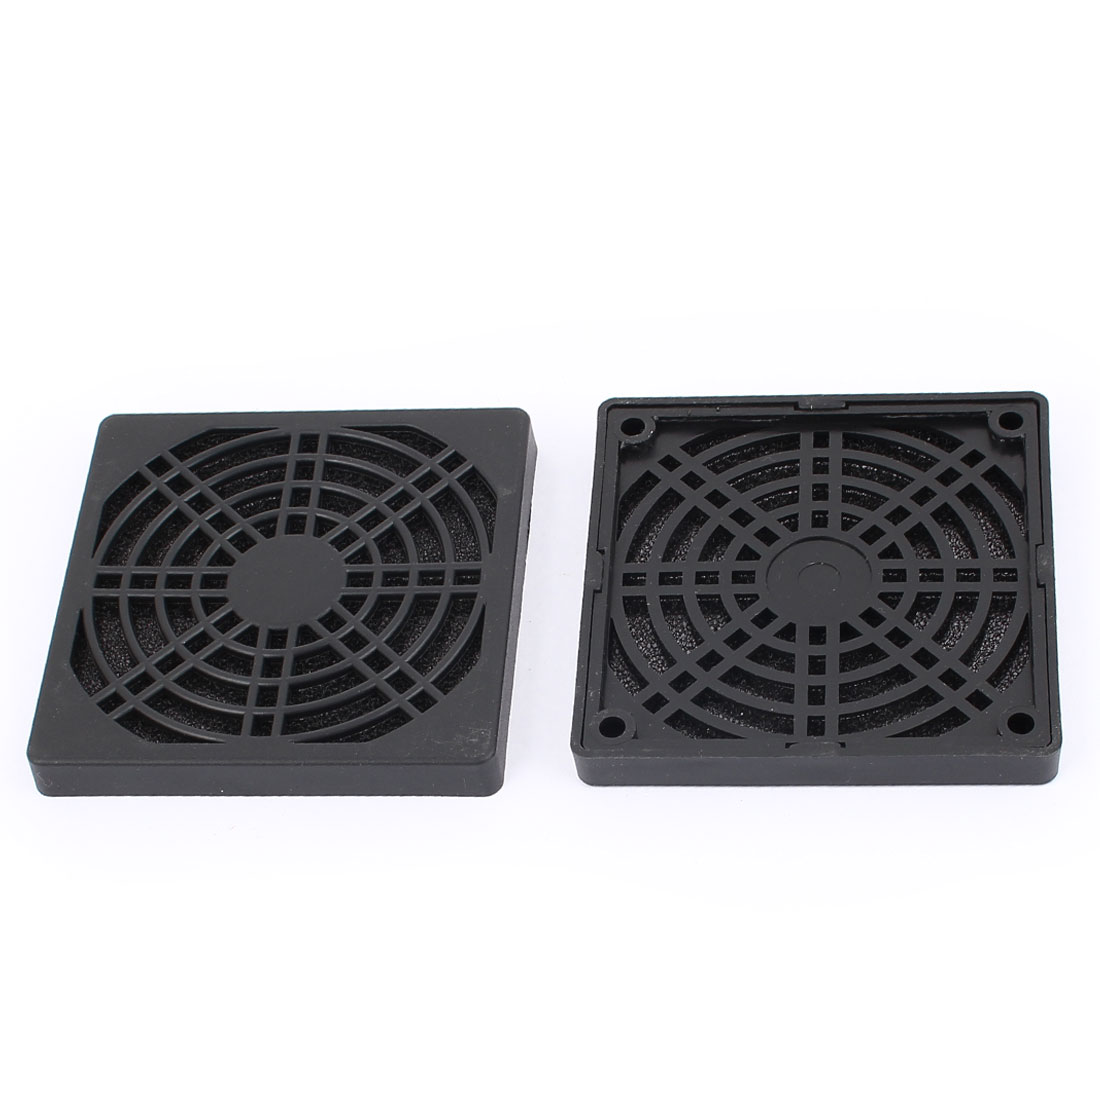 2PCS PC Case Fan 8.5cm Plastic Filter Dust Guard Dustproof Mesh Black